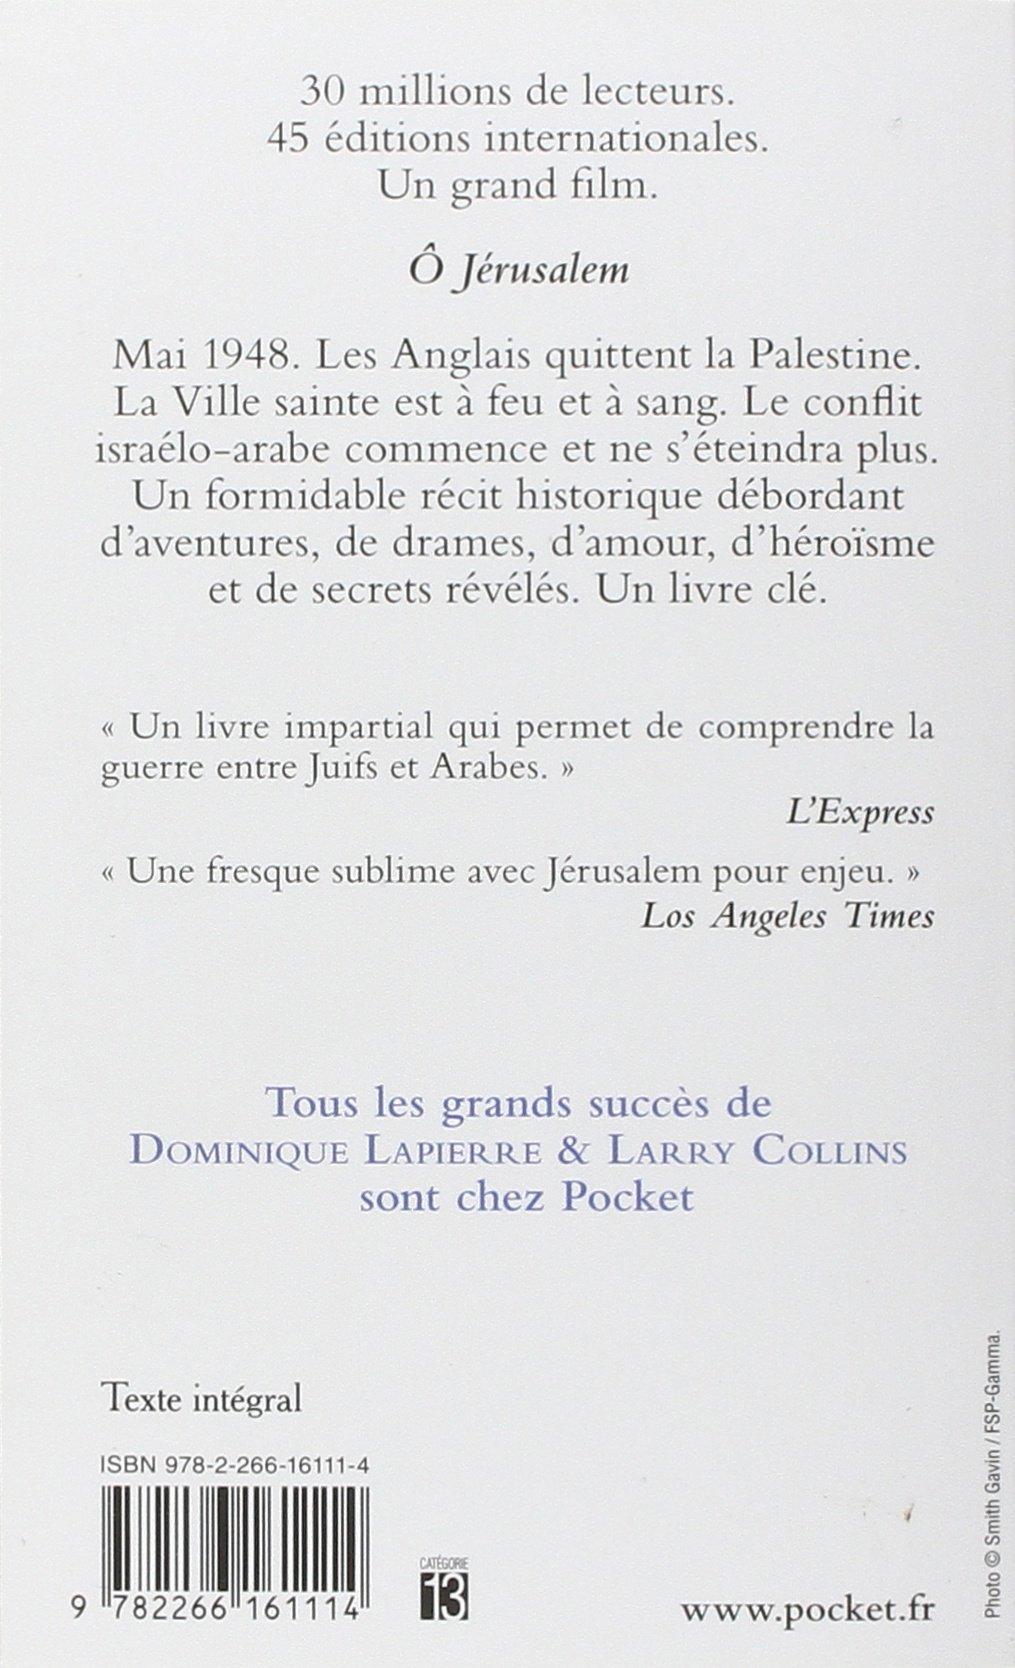 Amazoncom O Jerusalem 9782266161114 Dominique Lapierre